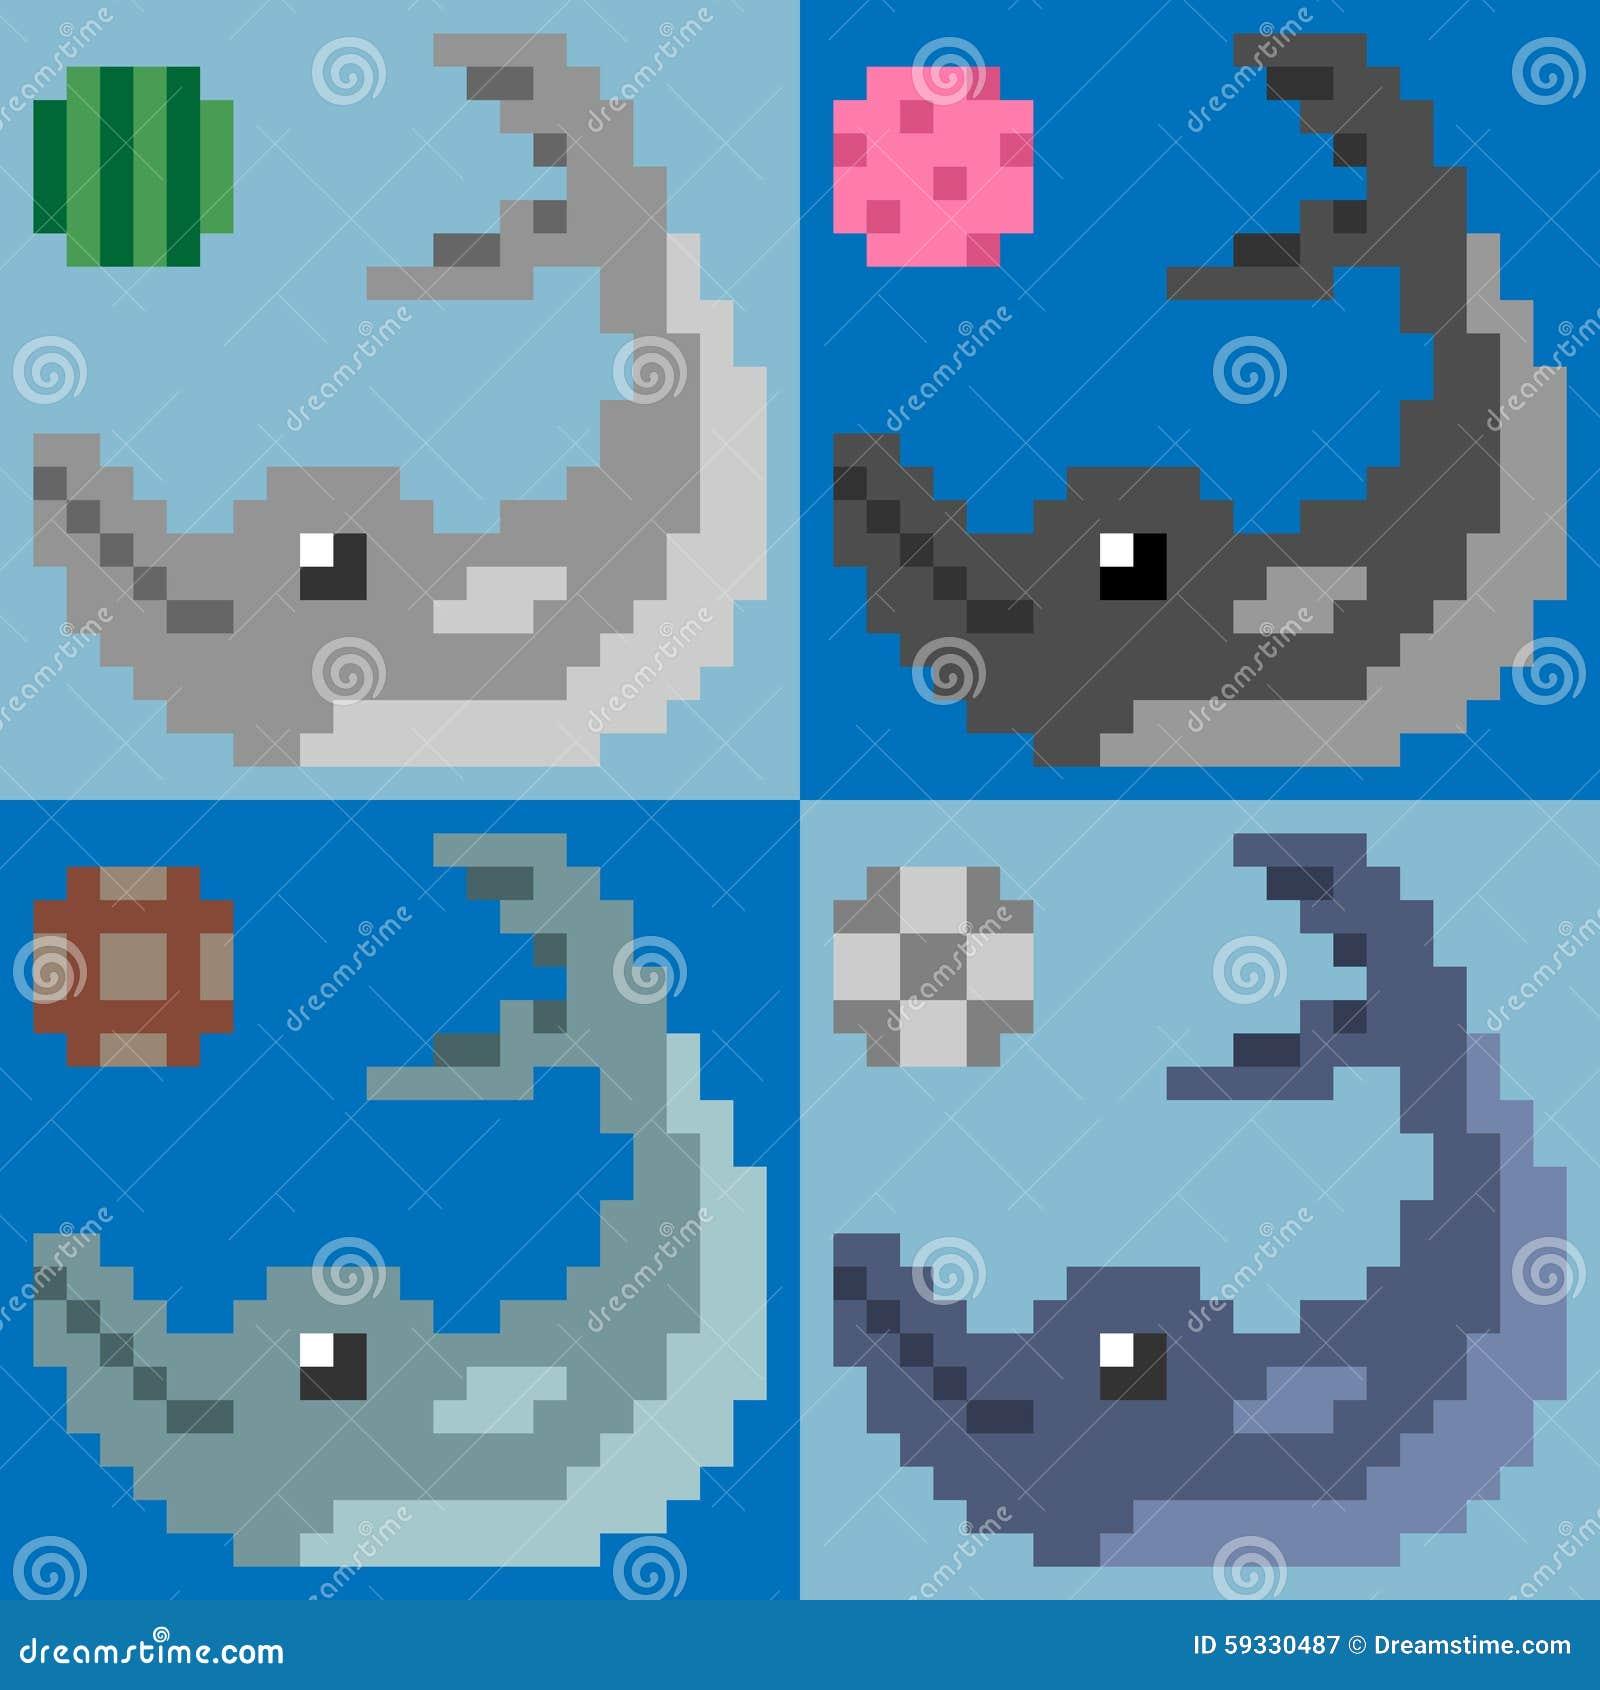 Illustration Pixel Art Dolphin Stock Vector Illustration